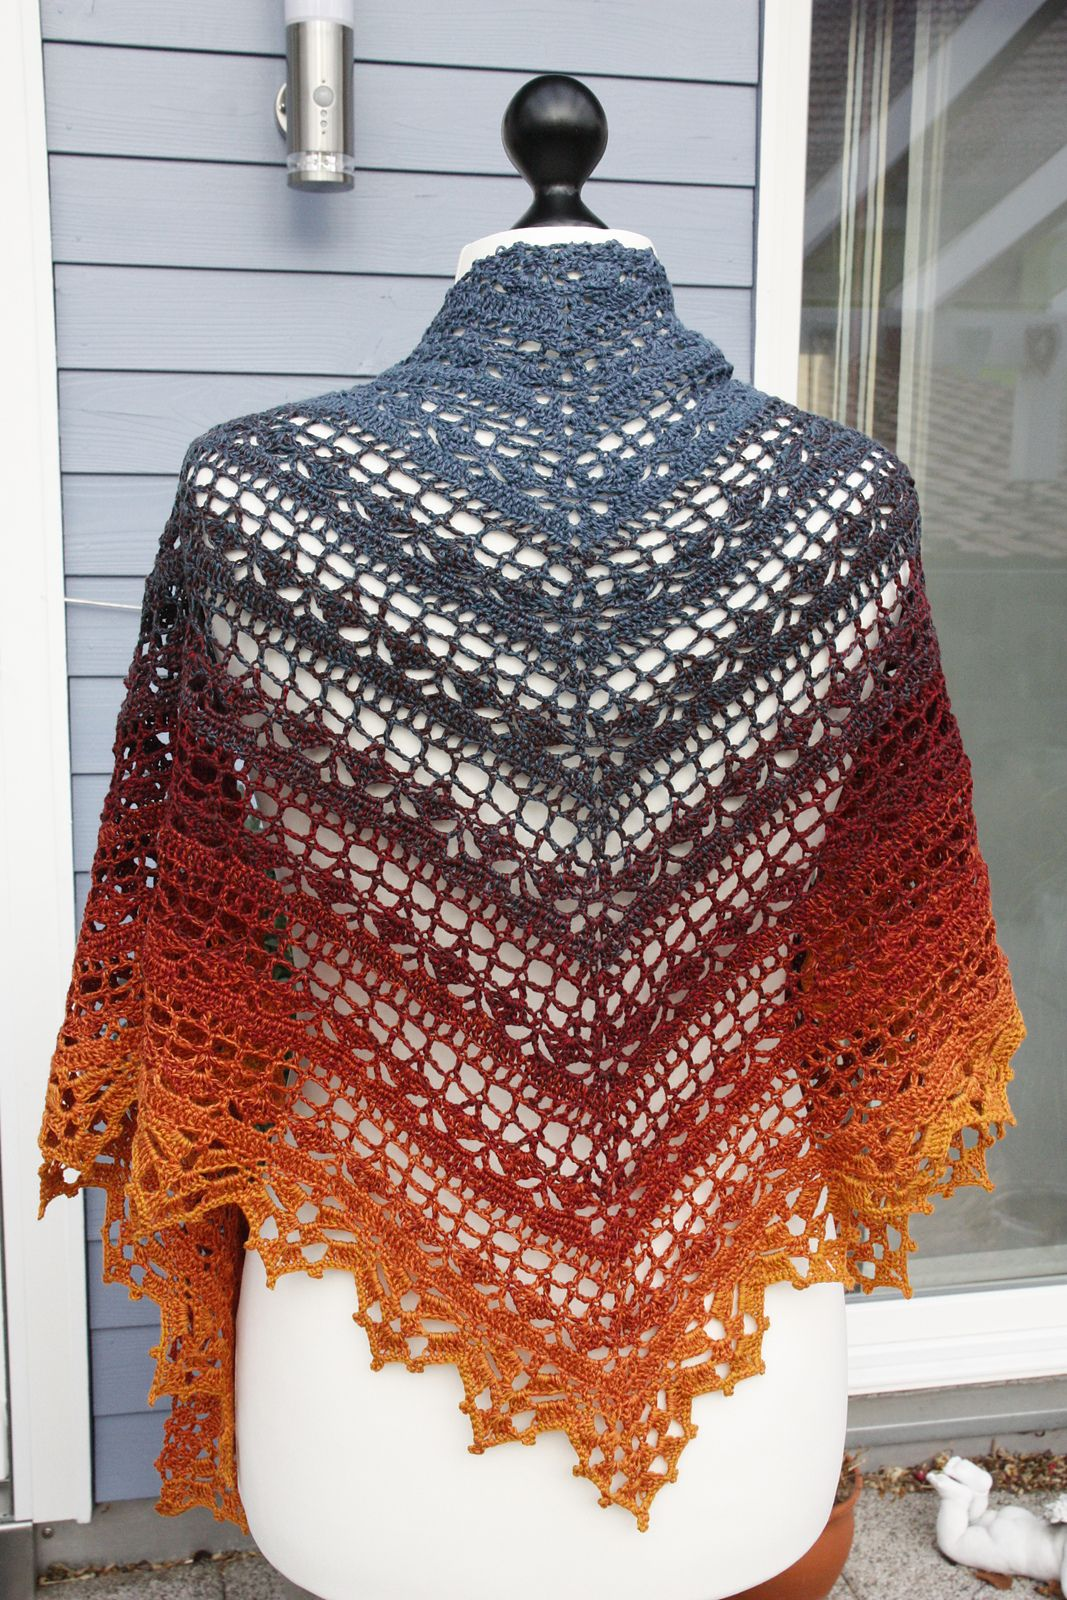 Bruinen shawl by jasmin rsnen free crochet pattern ravelry bruinen shawl by jasmin rsnen free crochet pattern ravelry bankloansurffo Image collections